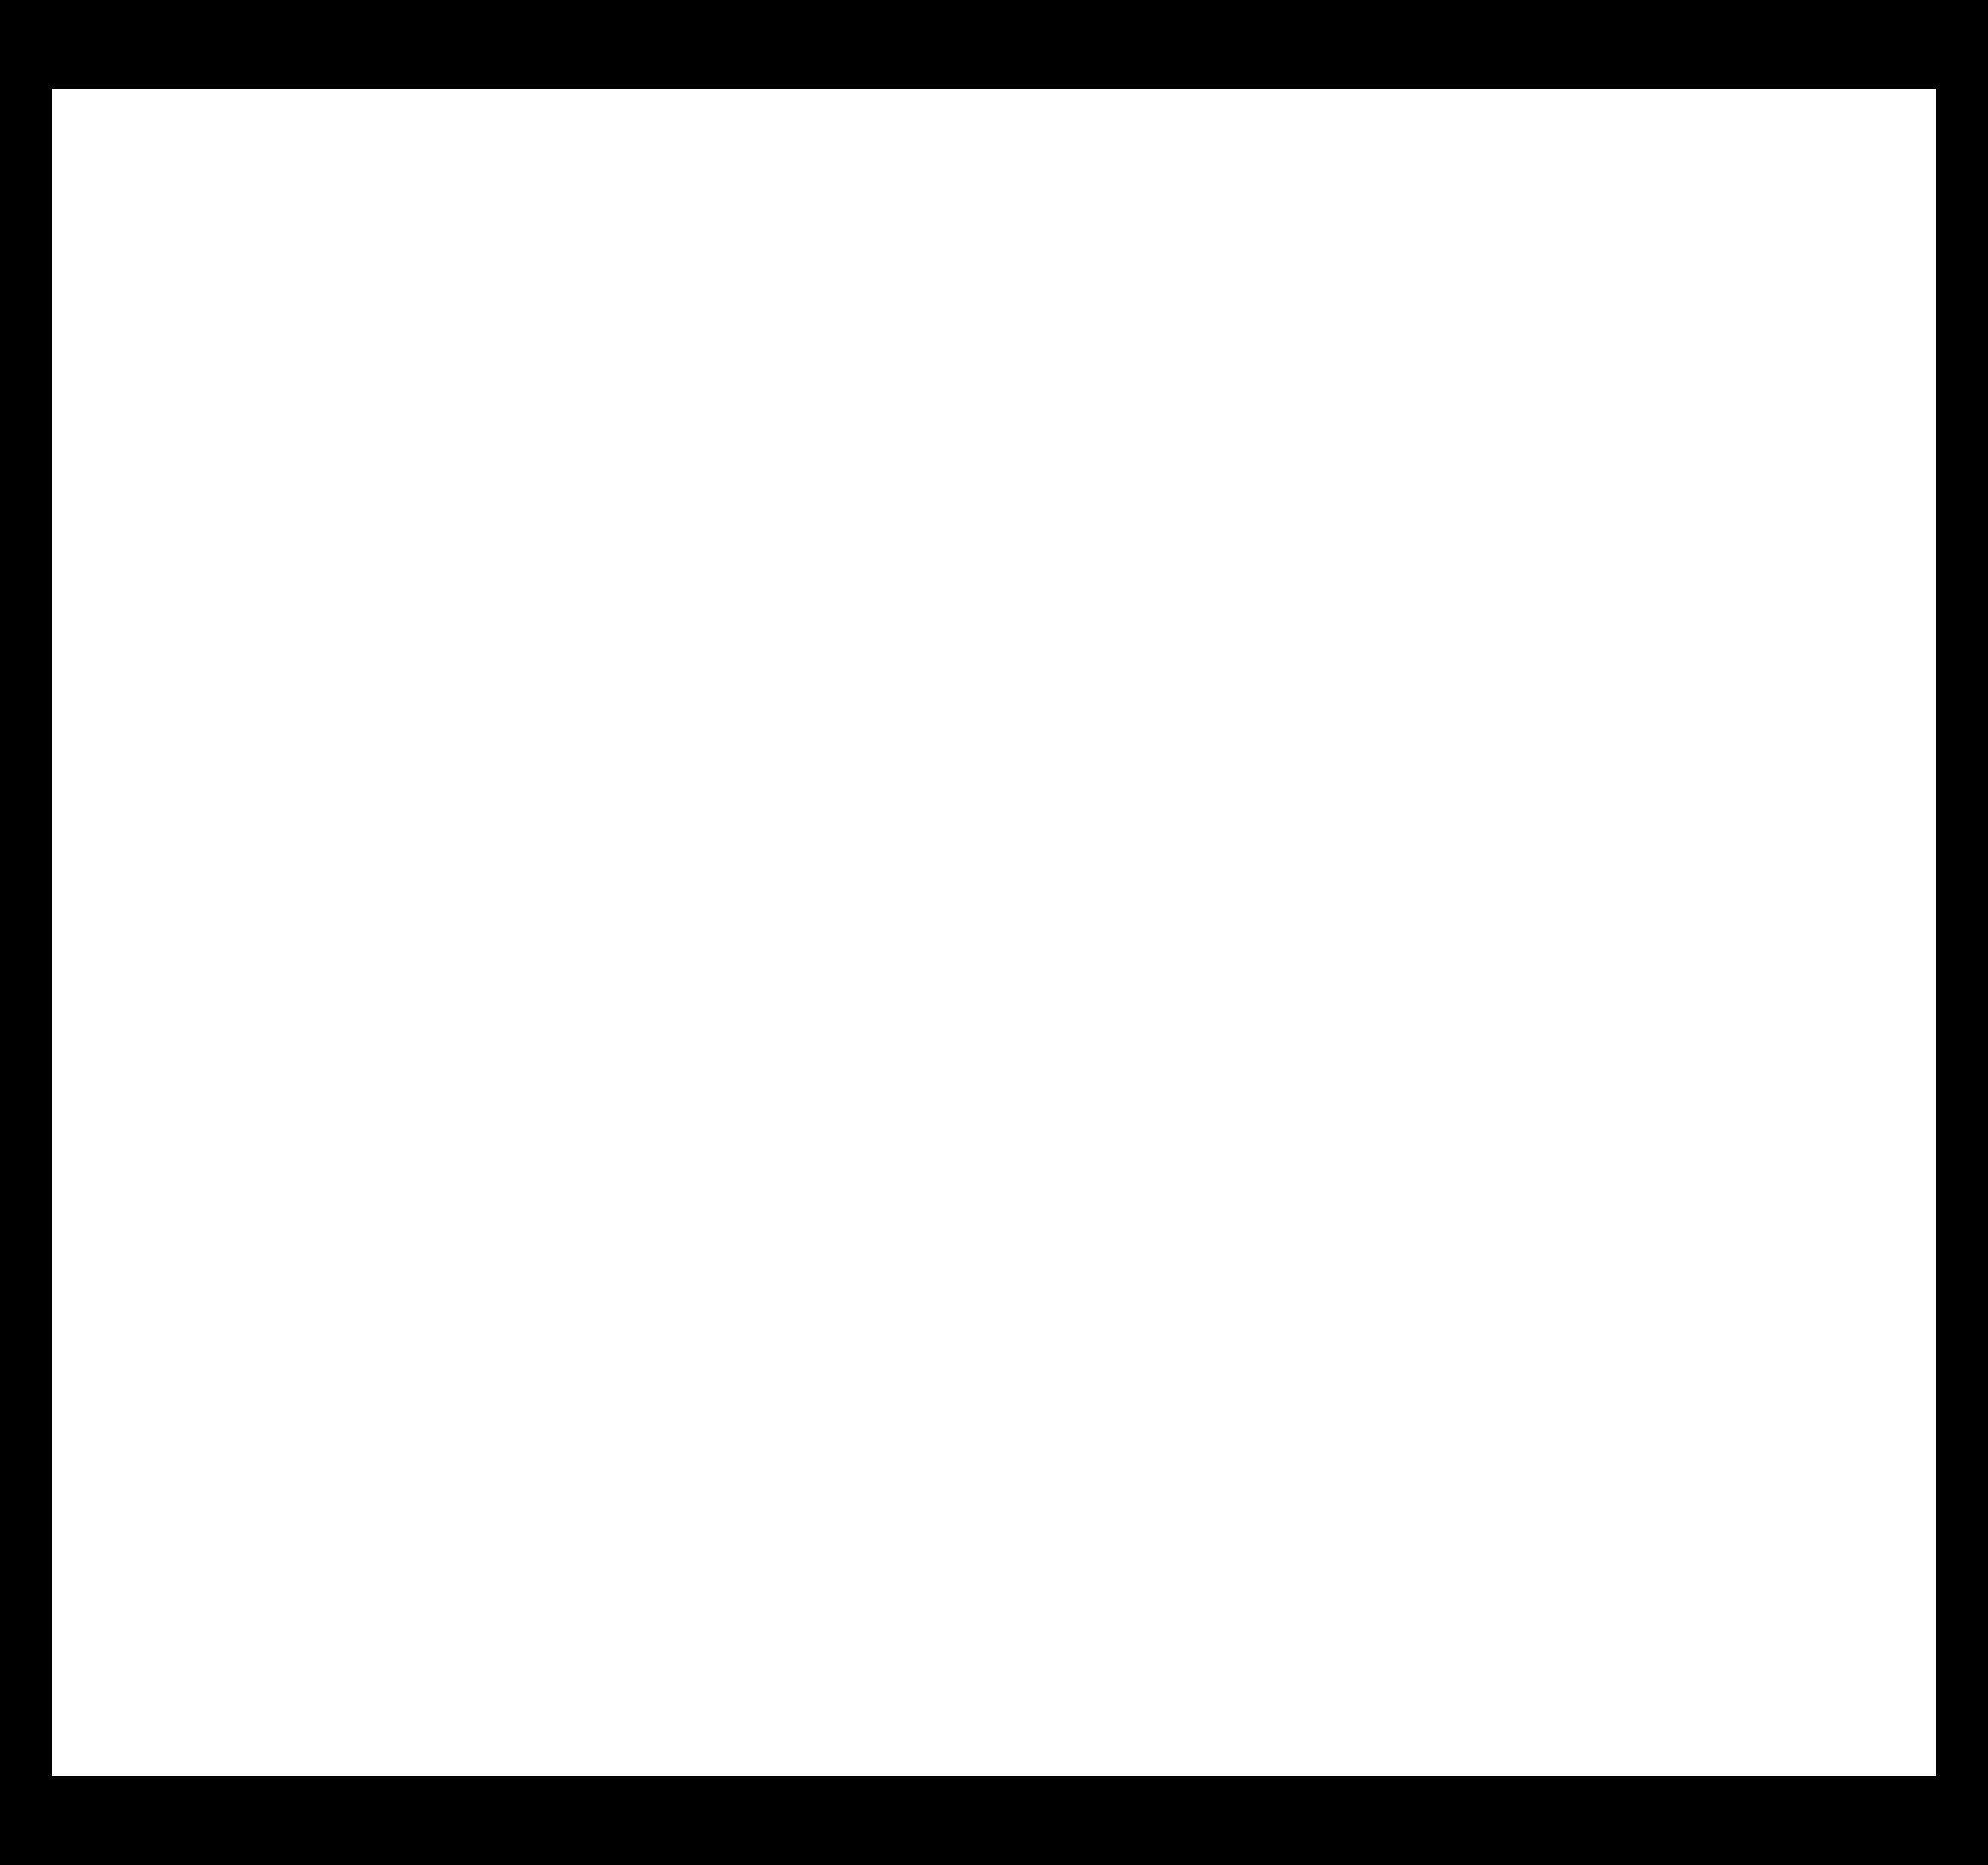 camps_international_camp_laos_white_logo